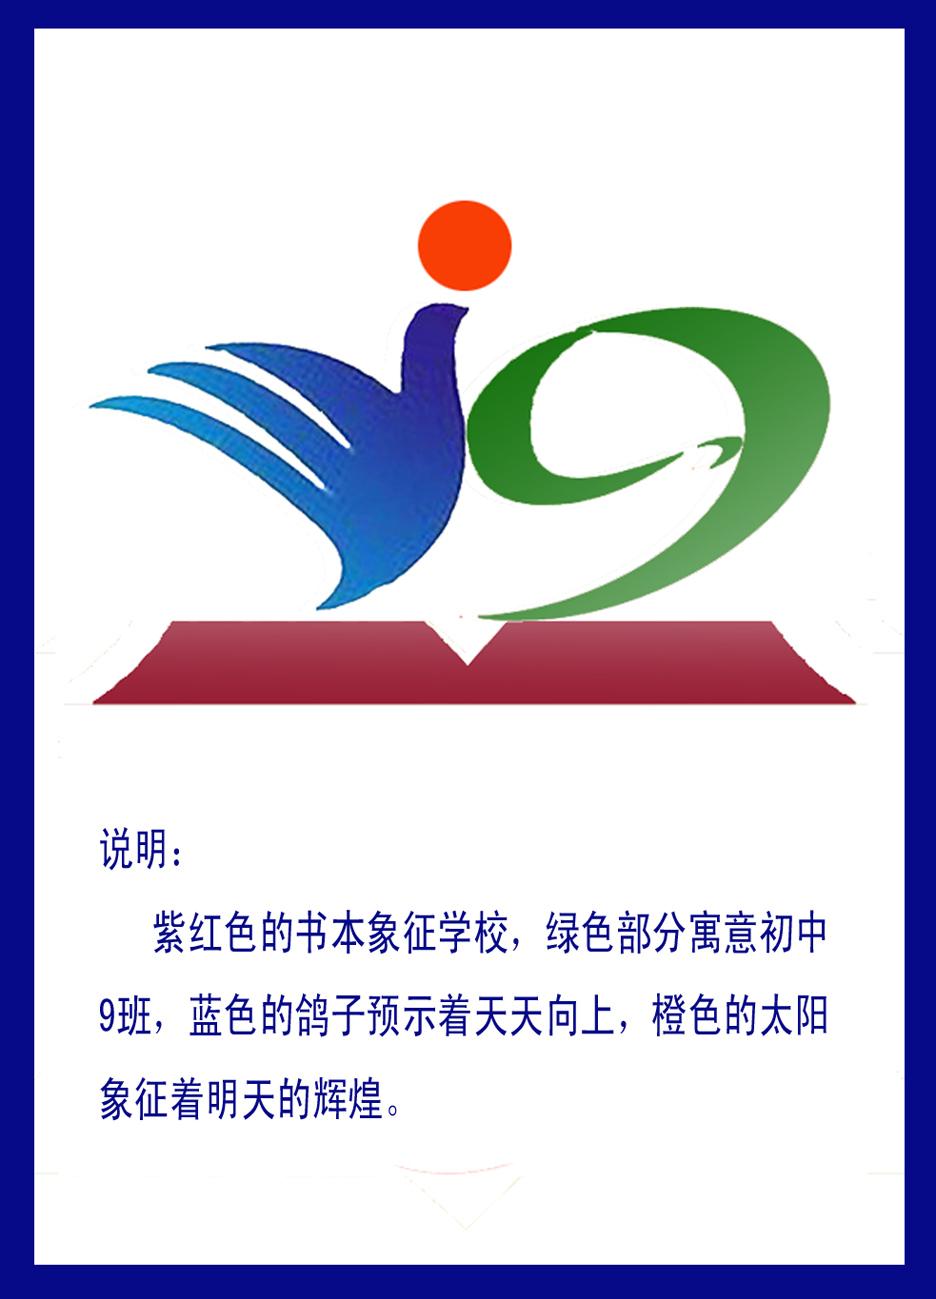 logo logo 标志 设计 图标 936_1299 竖版 竖屏图片